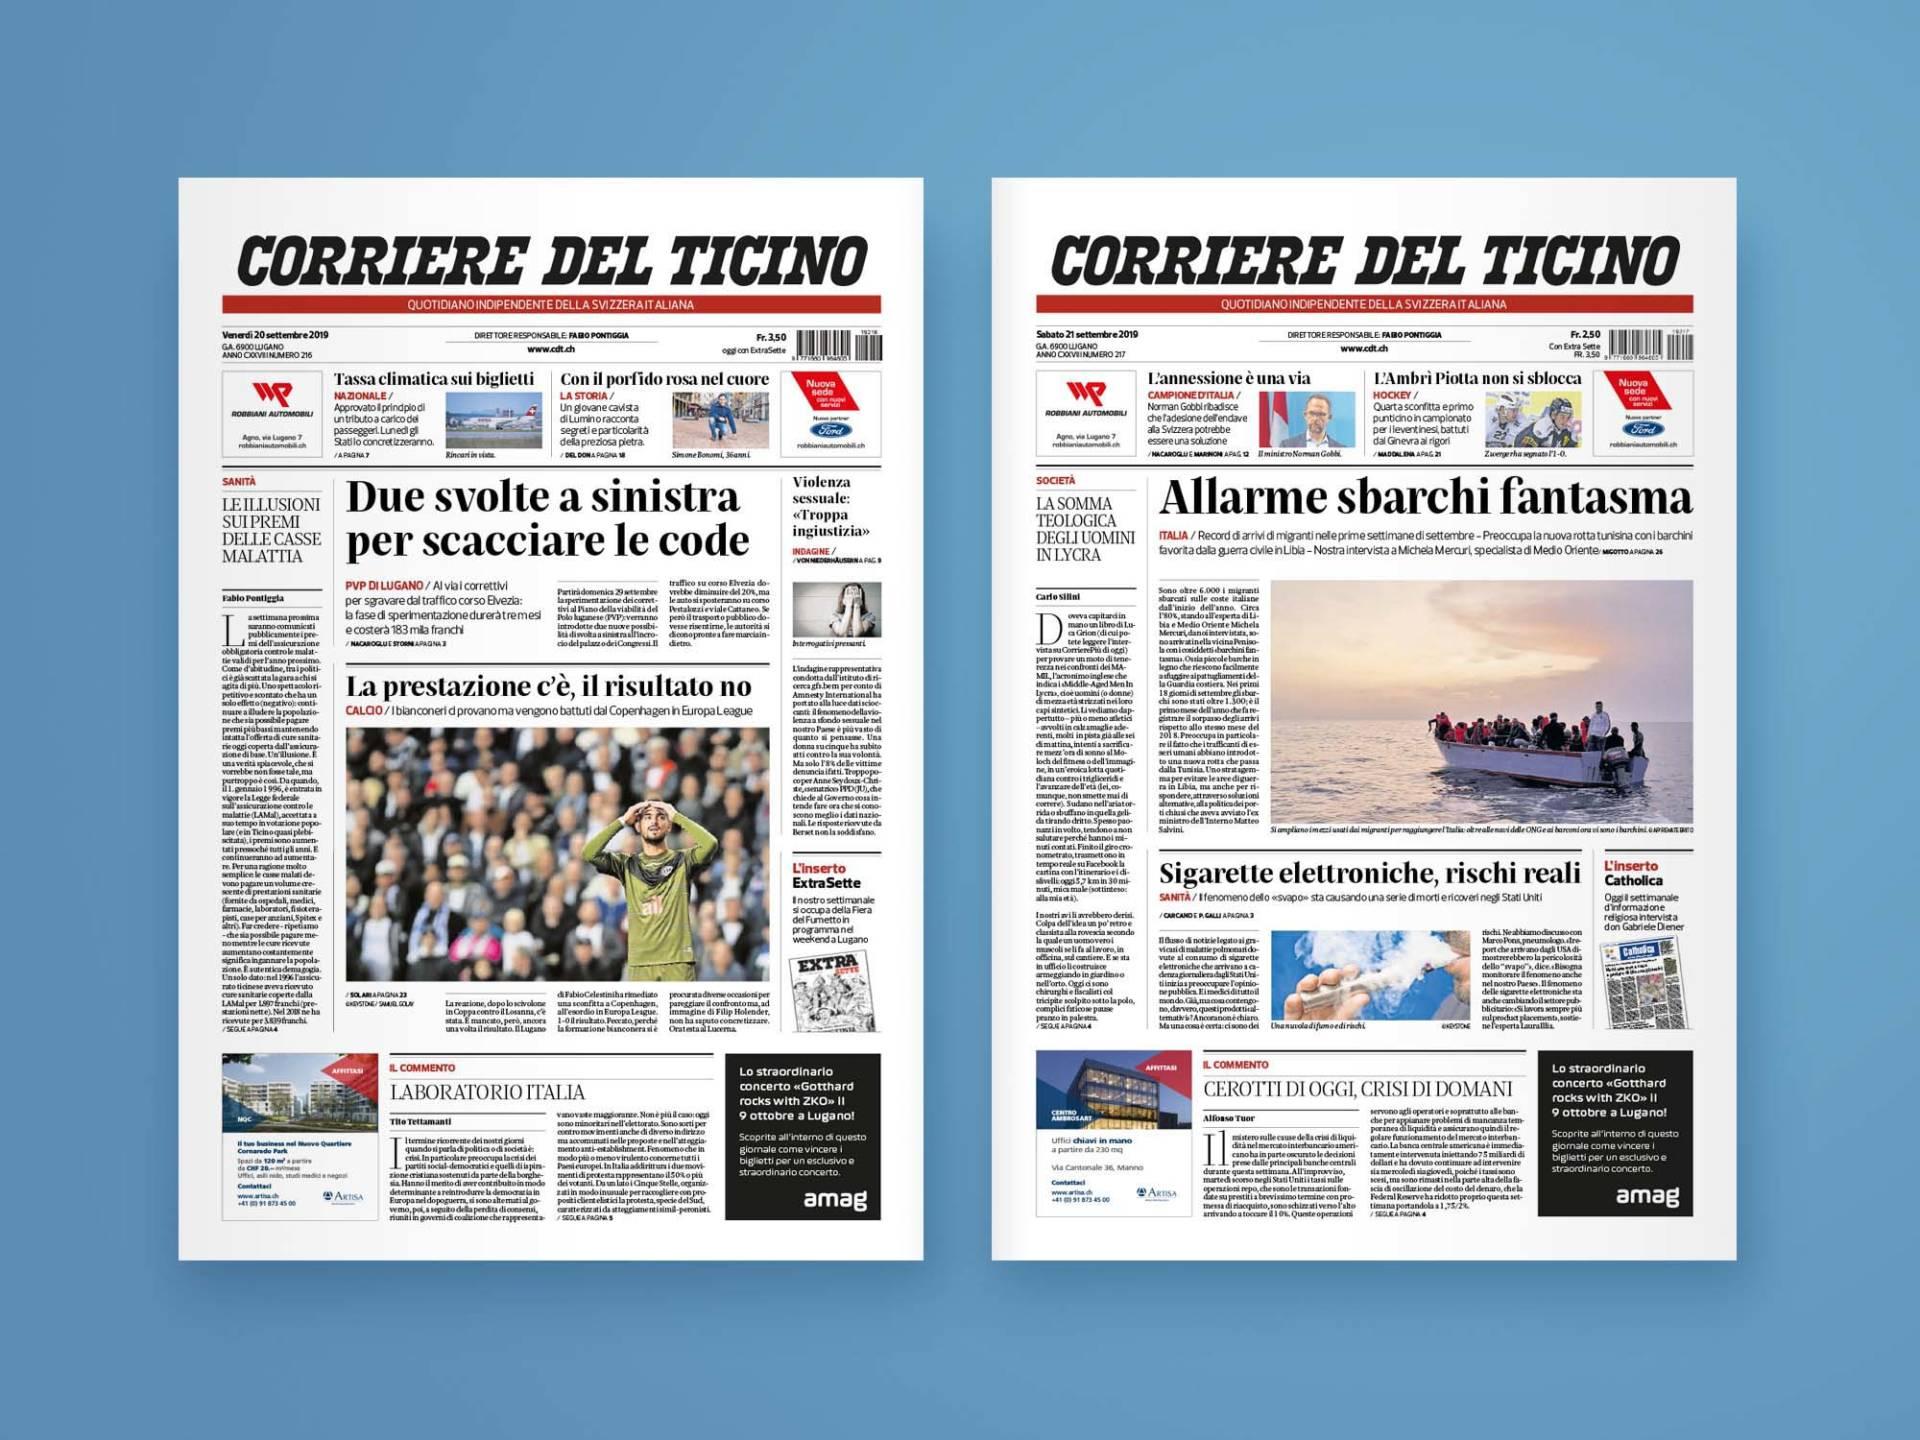 Corriere_Del_Ticino_02_Wenceslau_News_Design